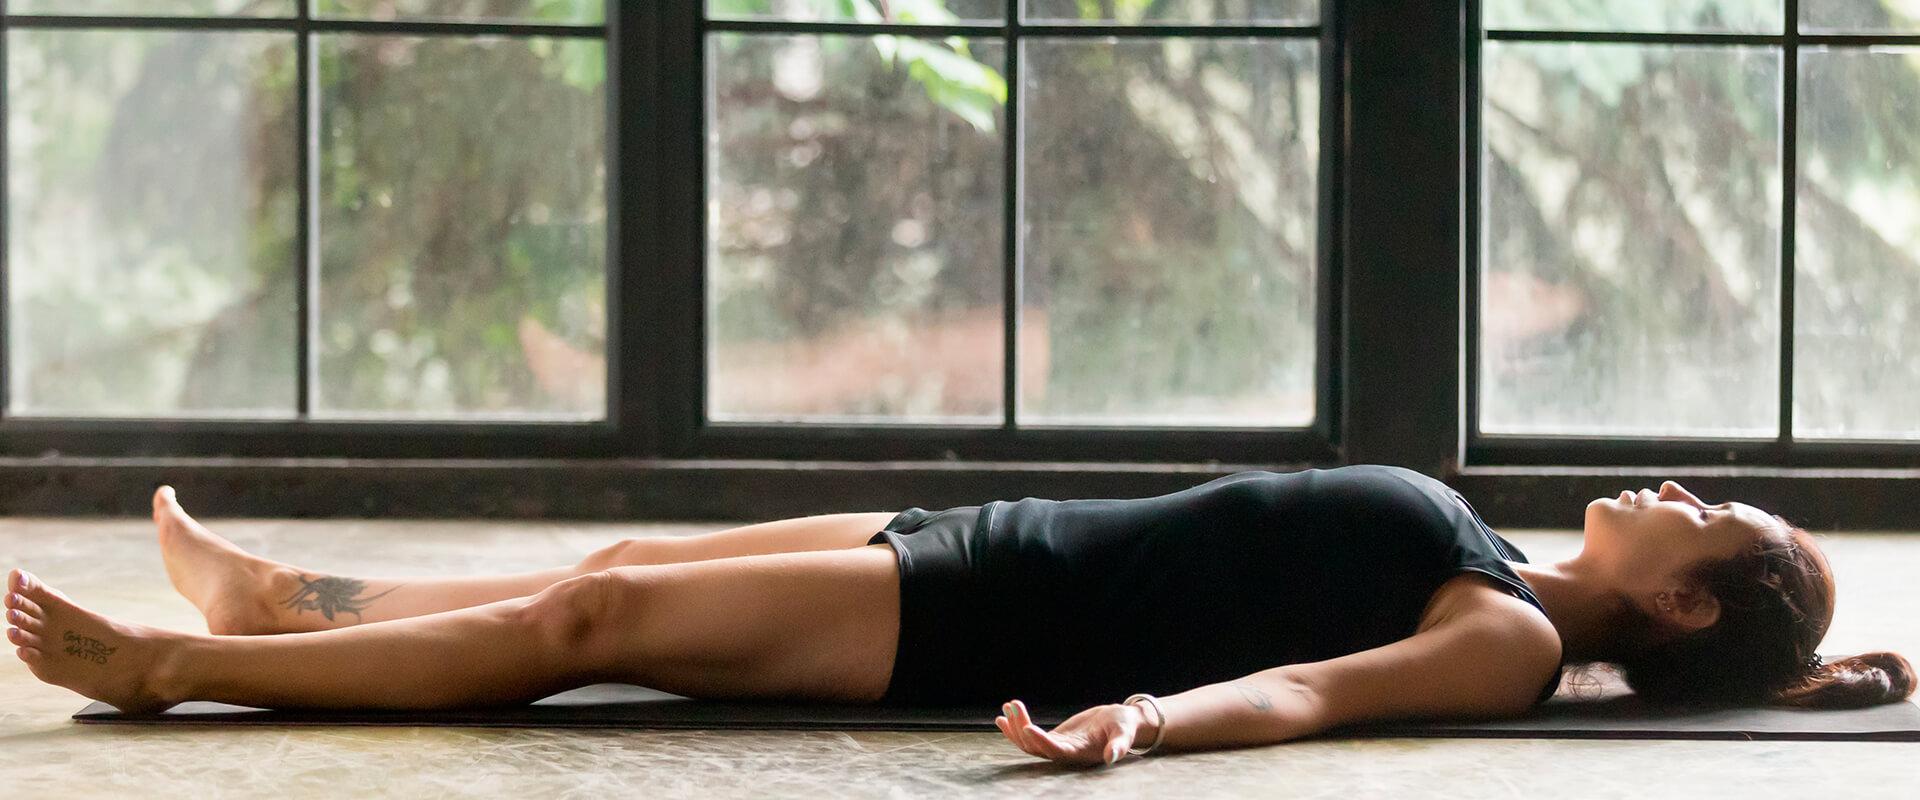 mujer-yoga-savasana-almohada-soñare